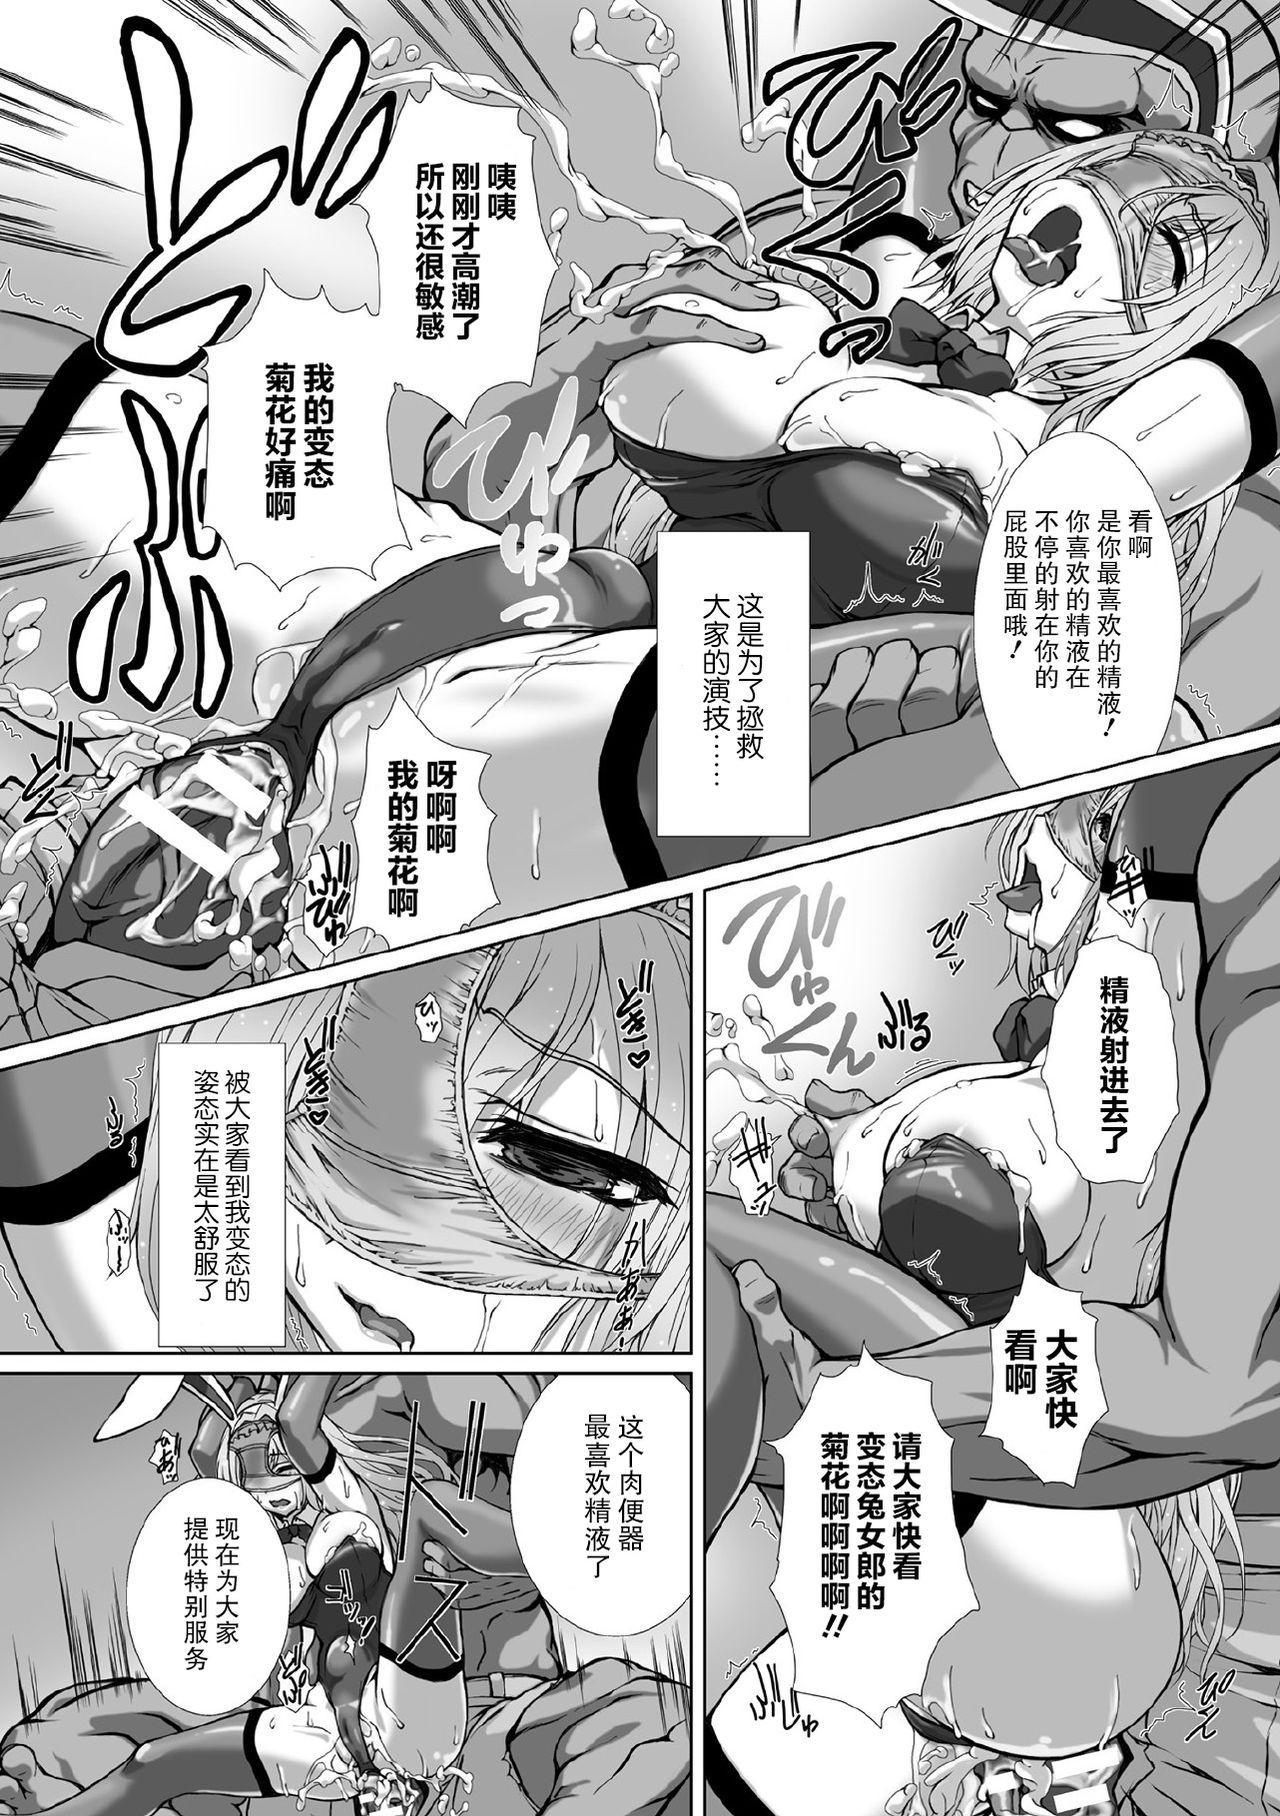 Hengen Souki Shine Mirage THE COMIC EPISODE 8 19